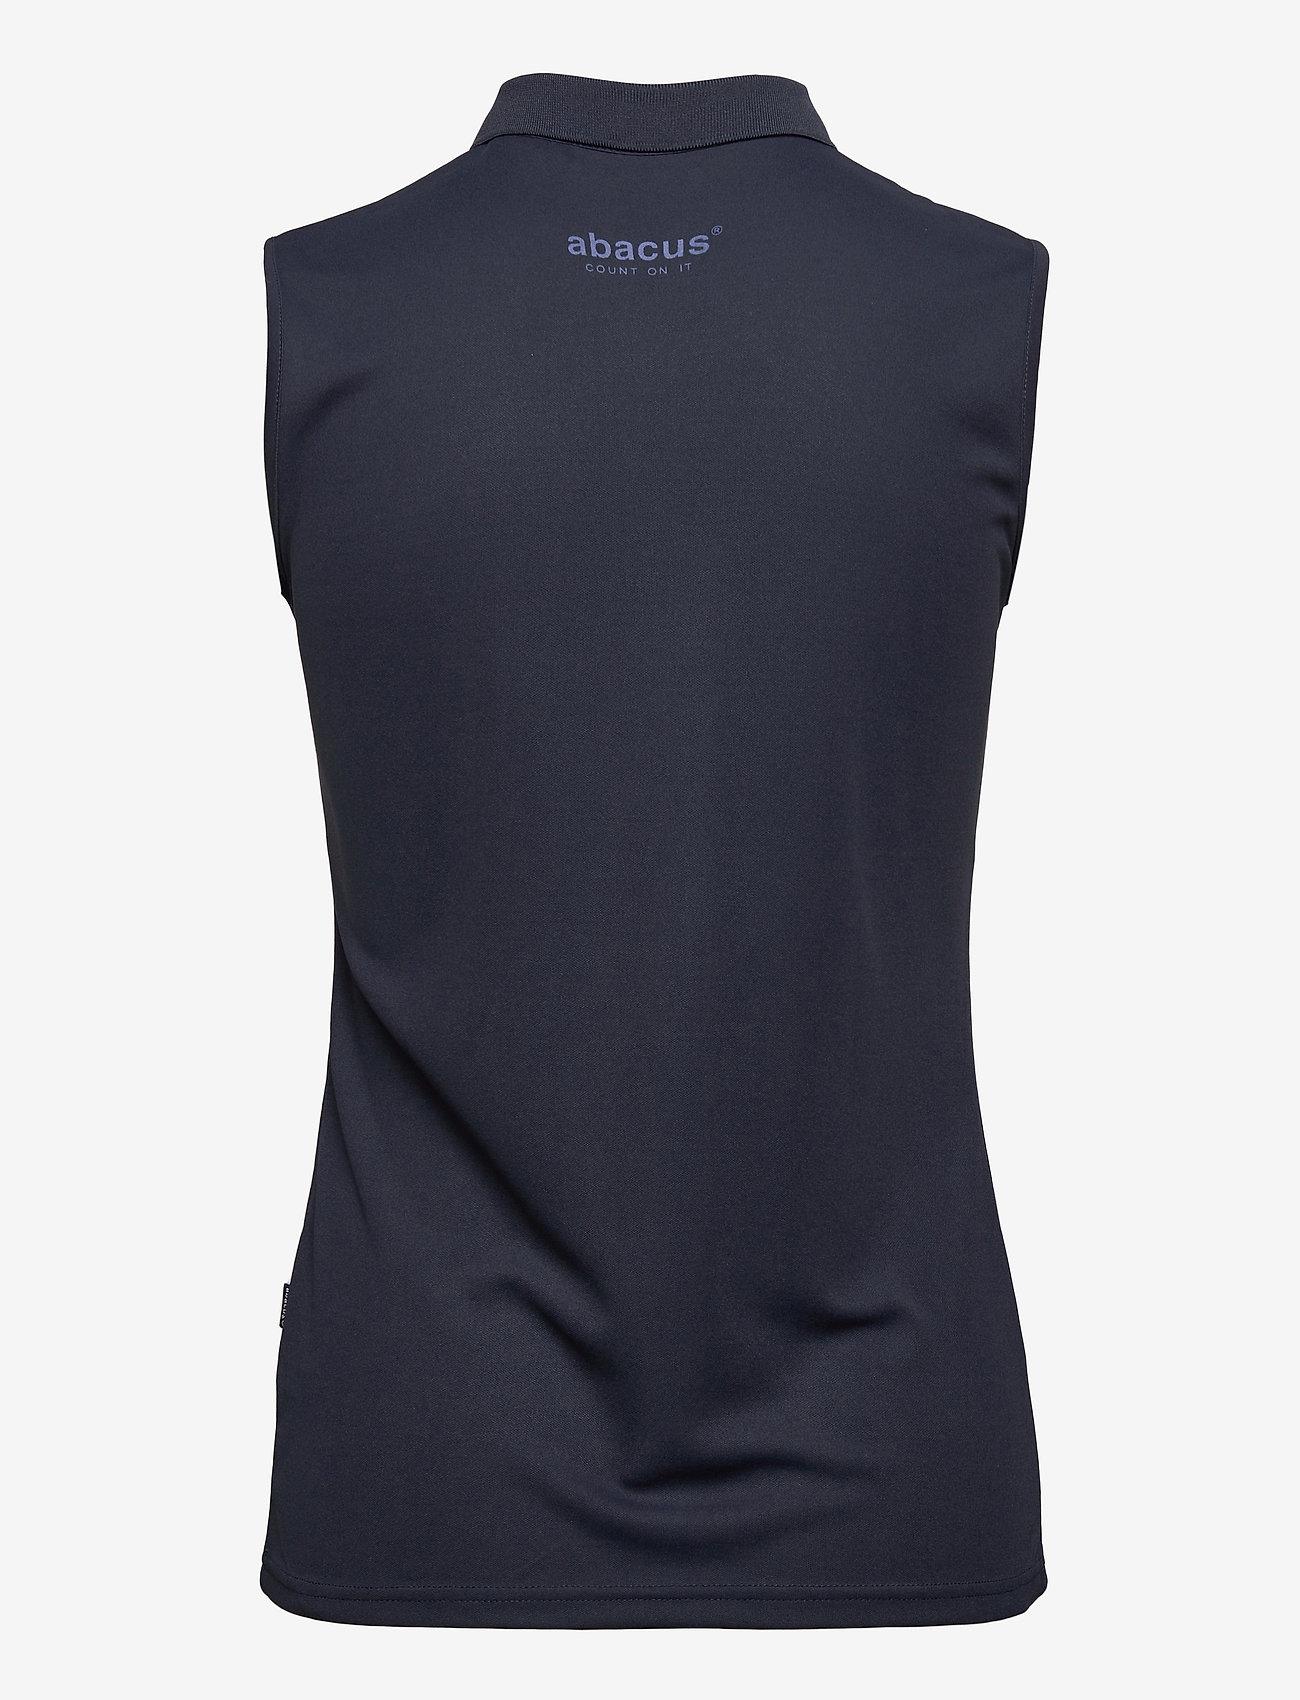 Abacus - Lds Cray sleeveless - polo's - navy - 1